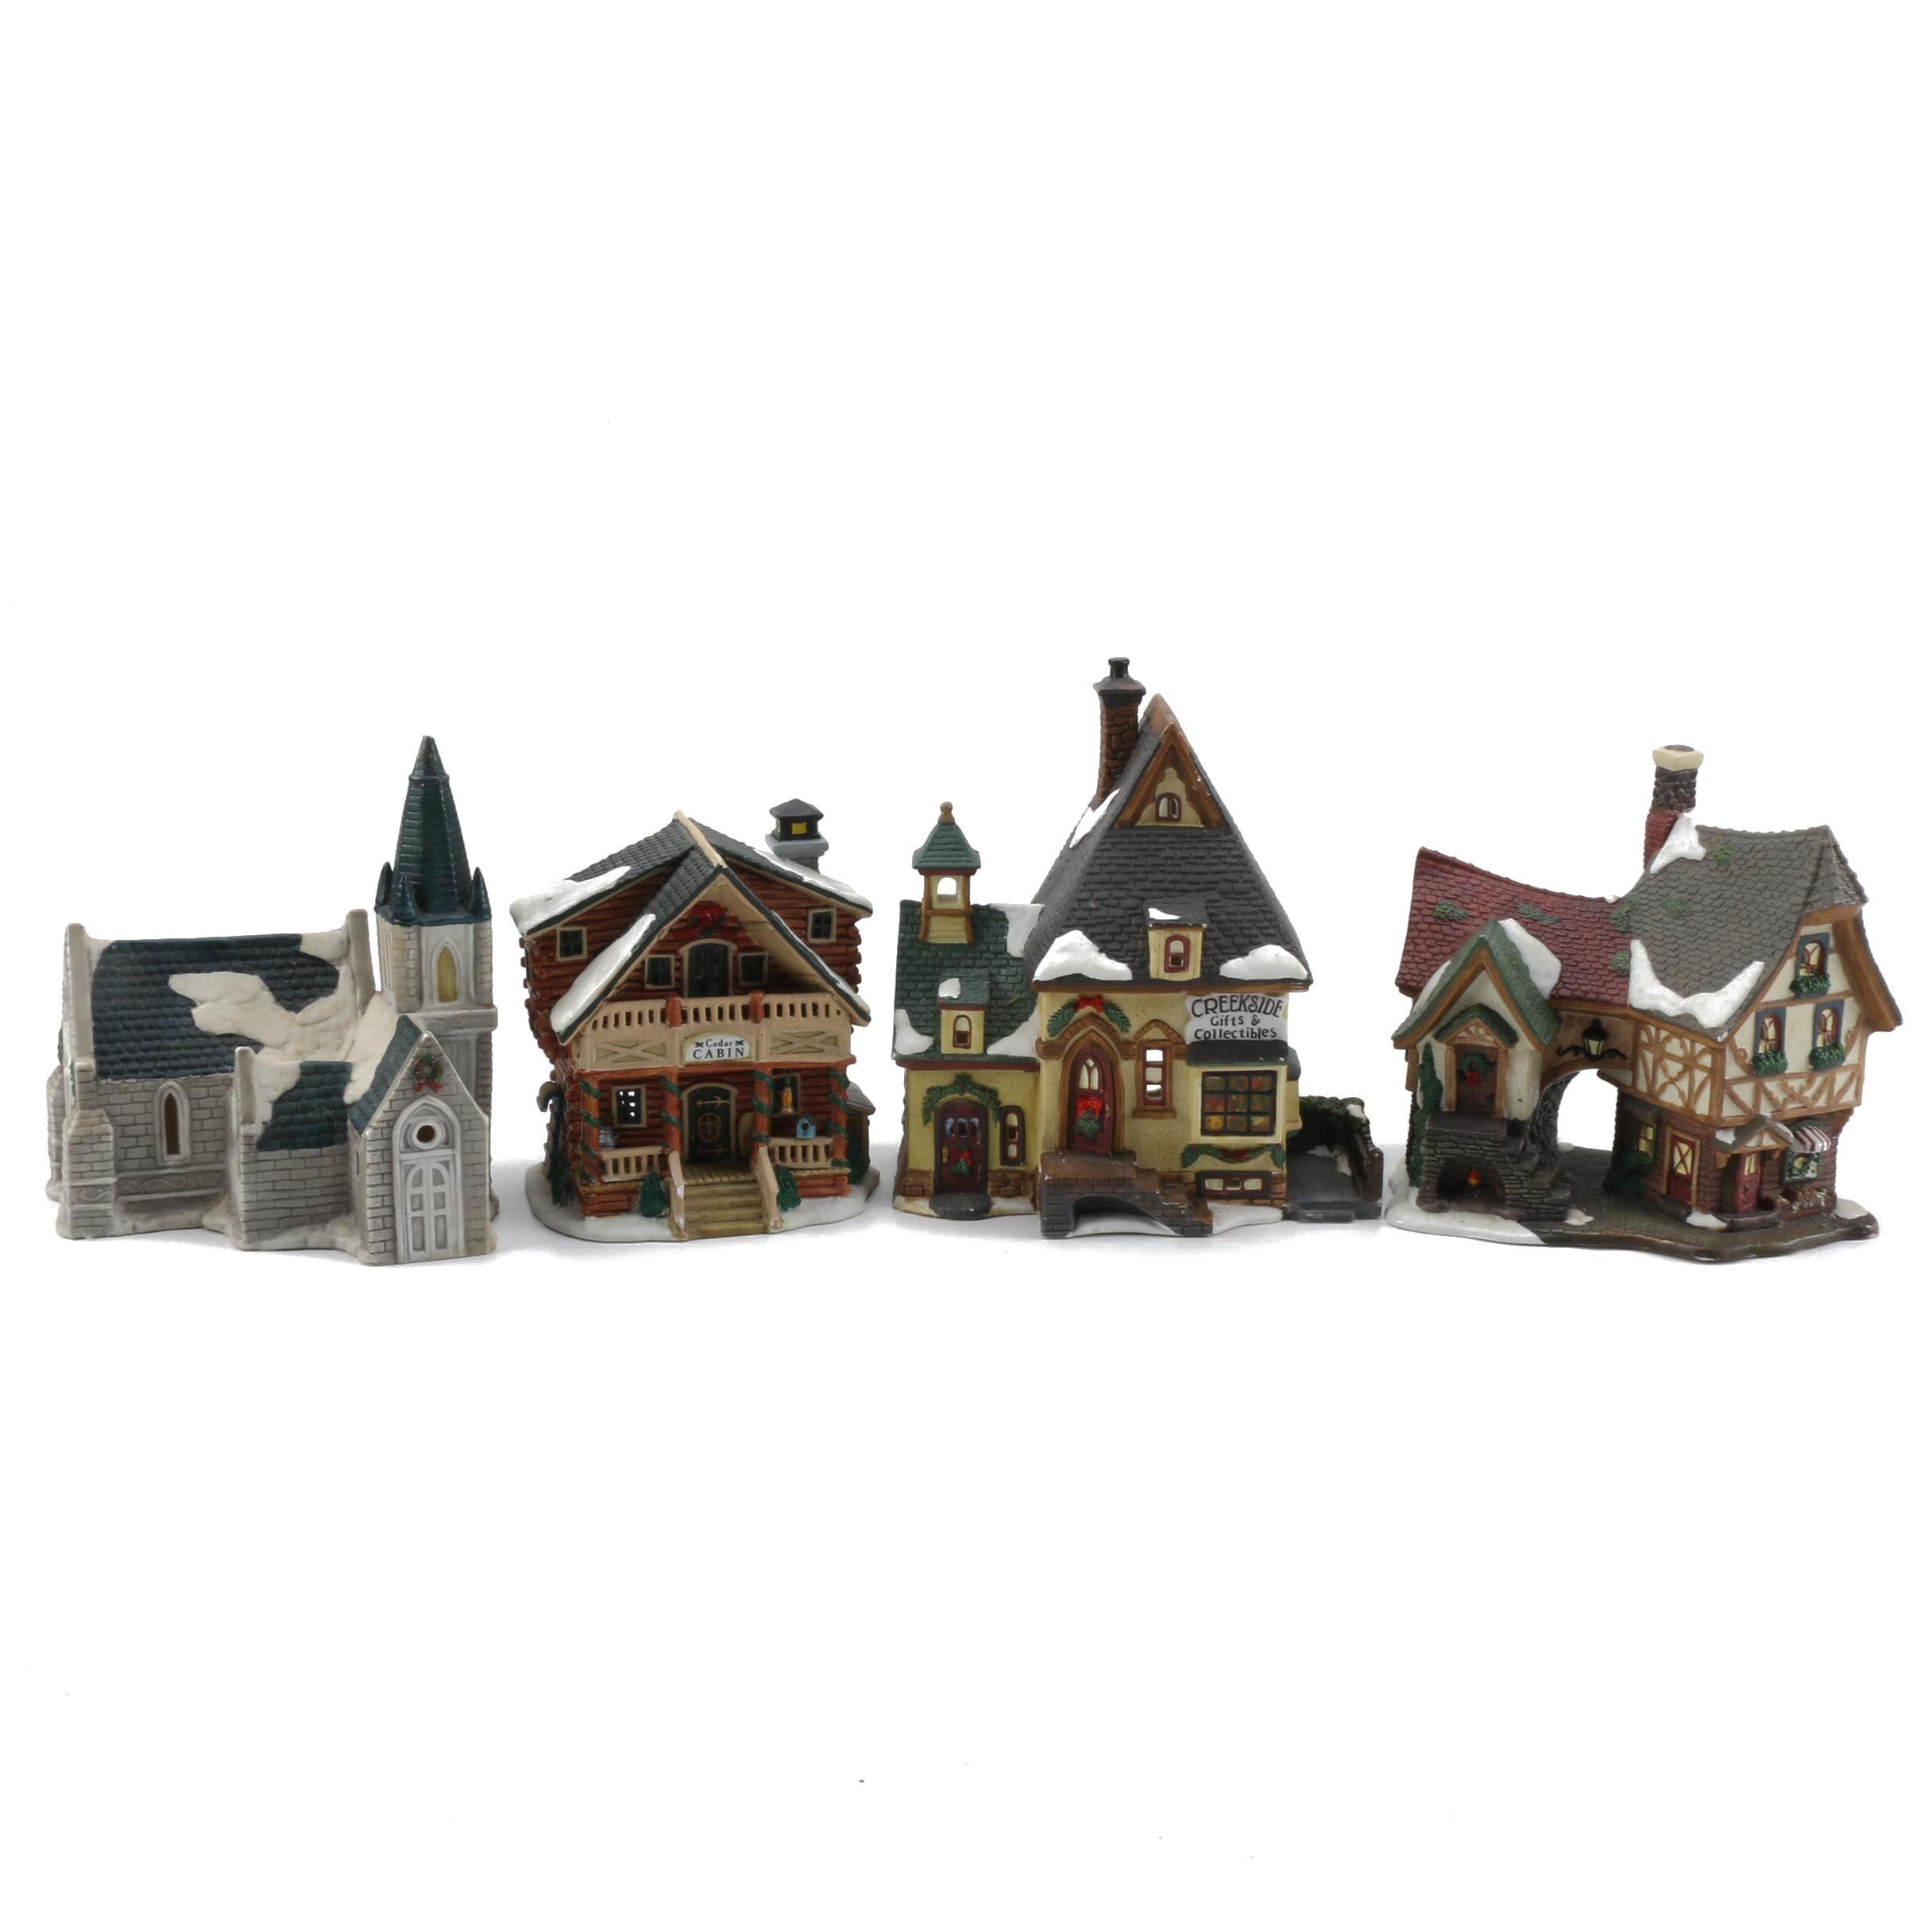 Ceramic Christmas Village Figurines